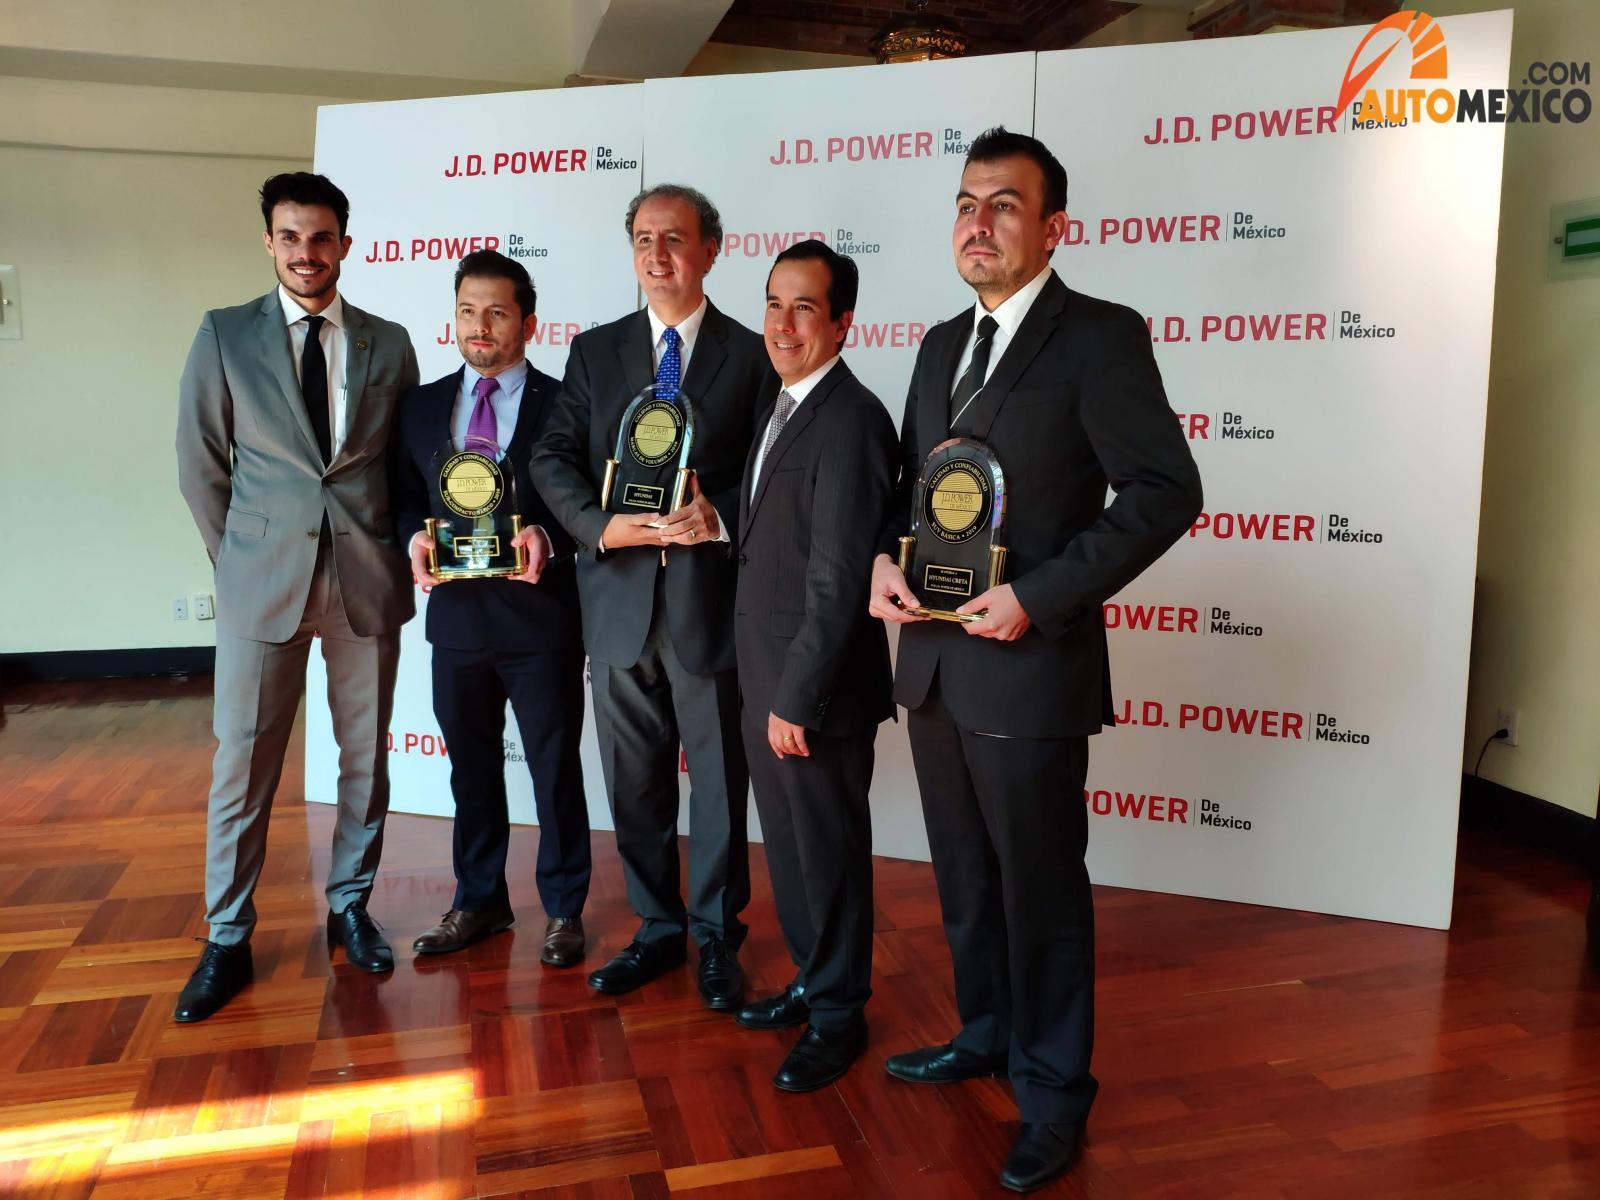 Hyundai reconocimientos VDS J.D. Power